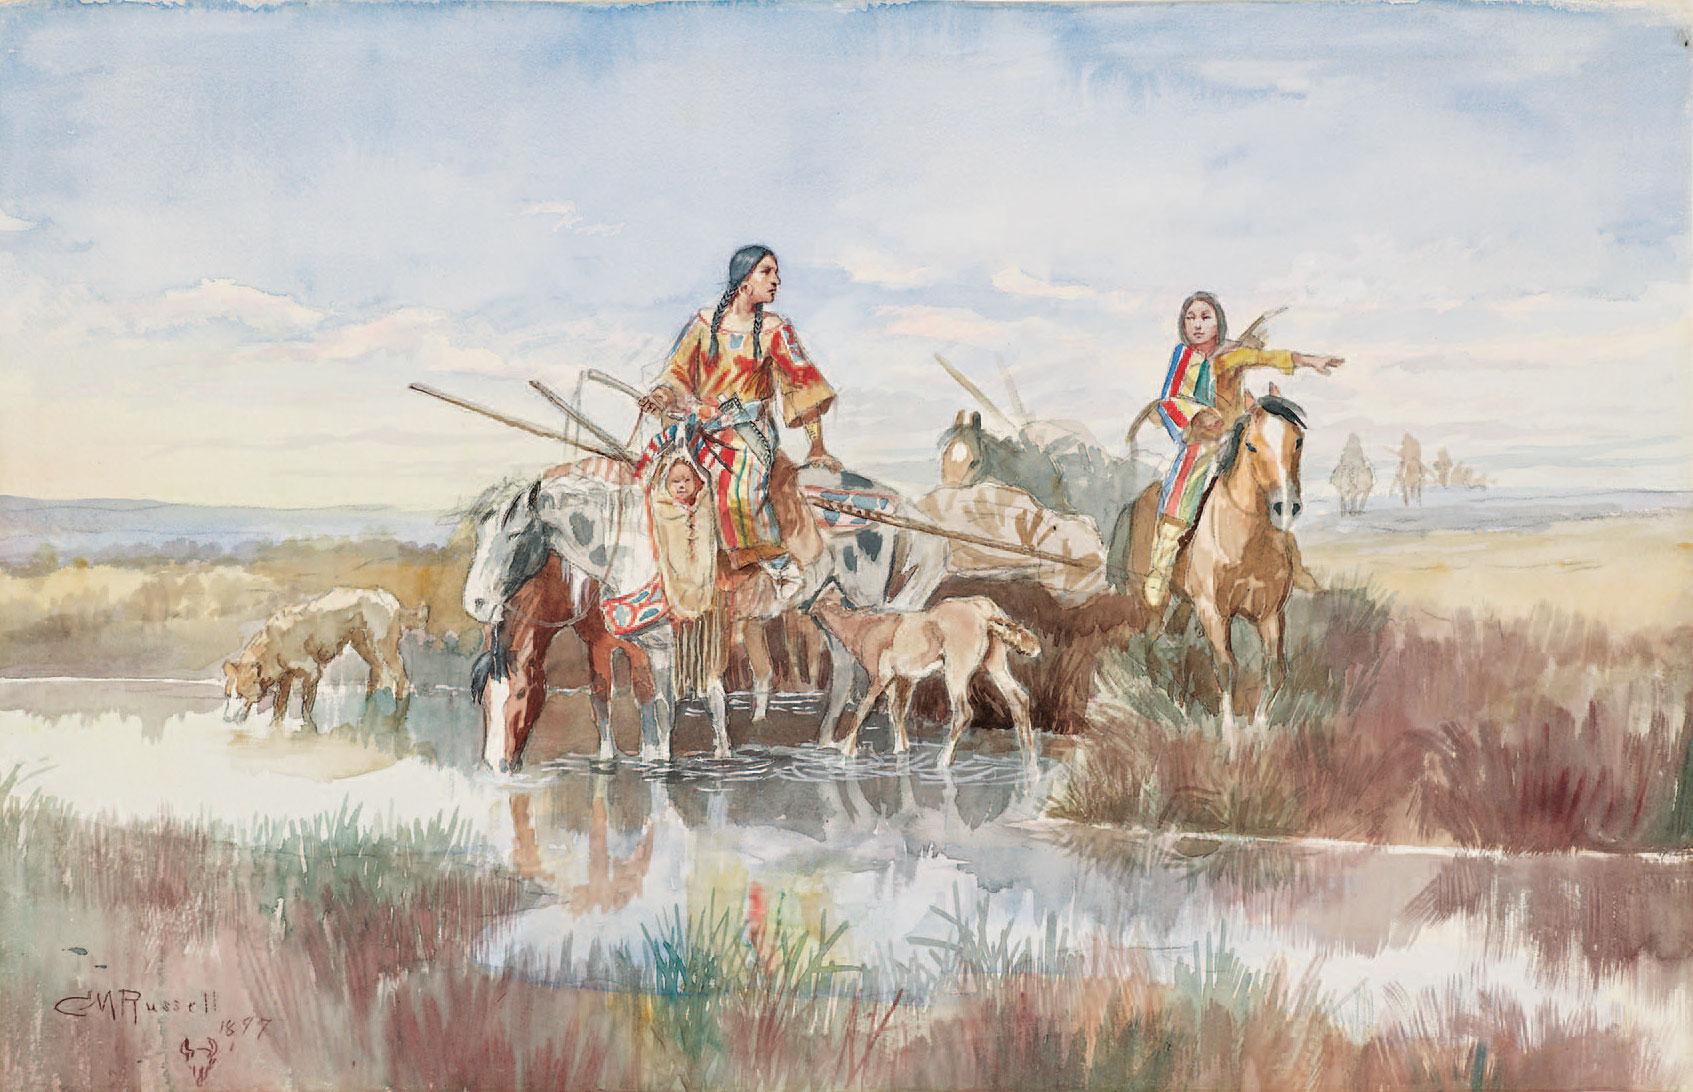 C Artist Russell Prints